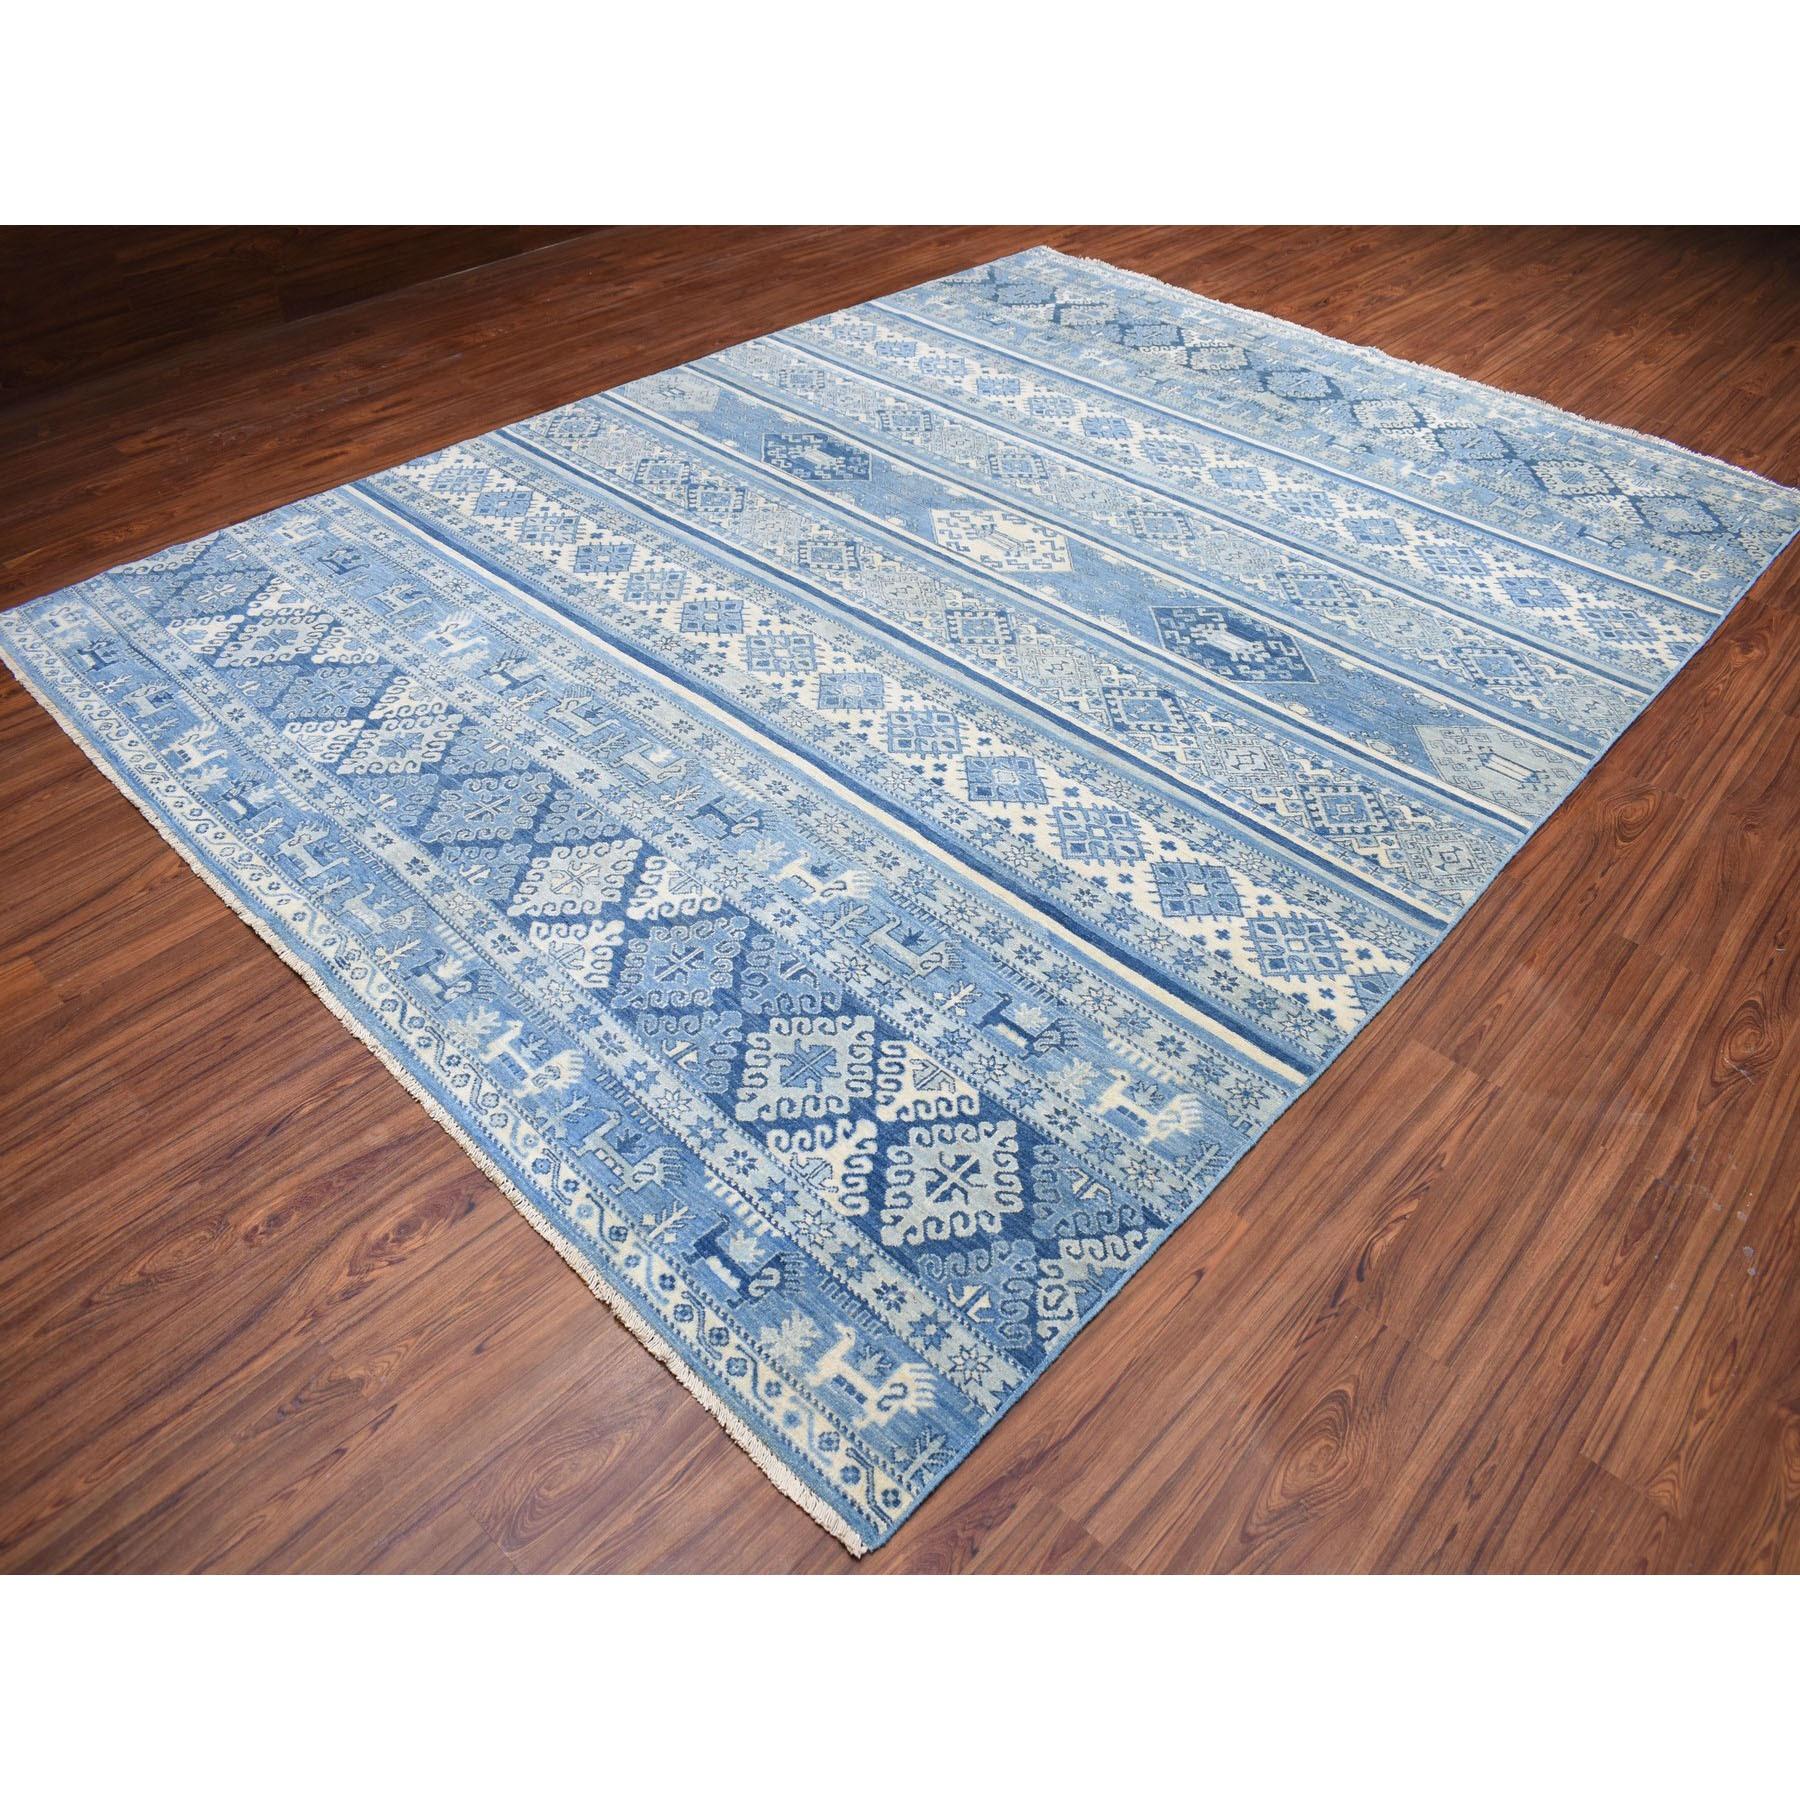 "9'x11'10"" Blue Super Kazak Khorjin Design Pure Wool Hand-Knotted Oriental Rug"